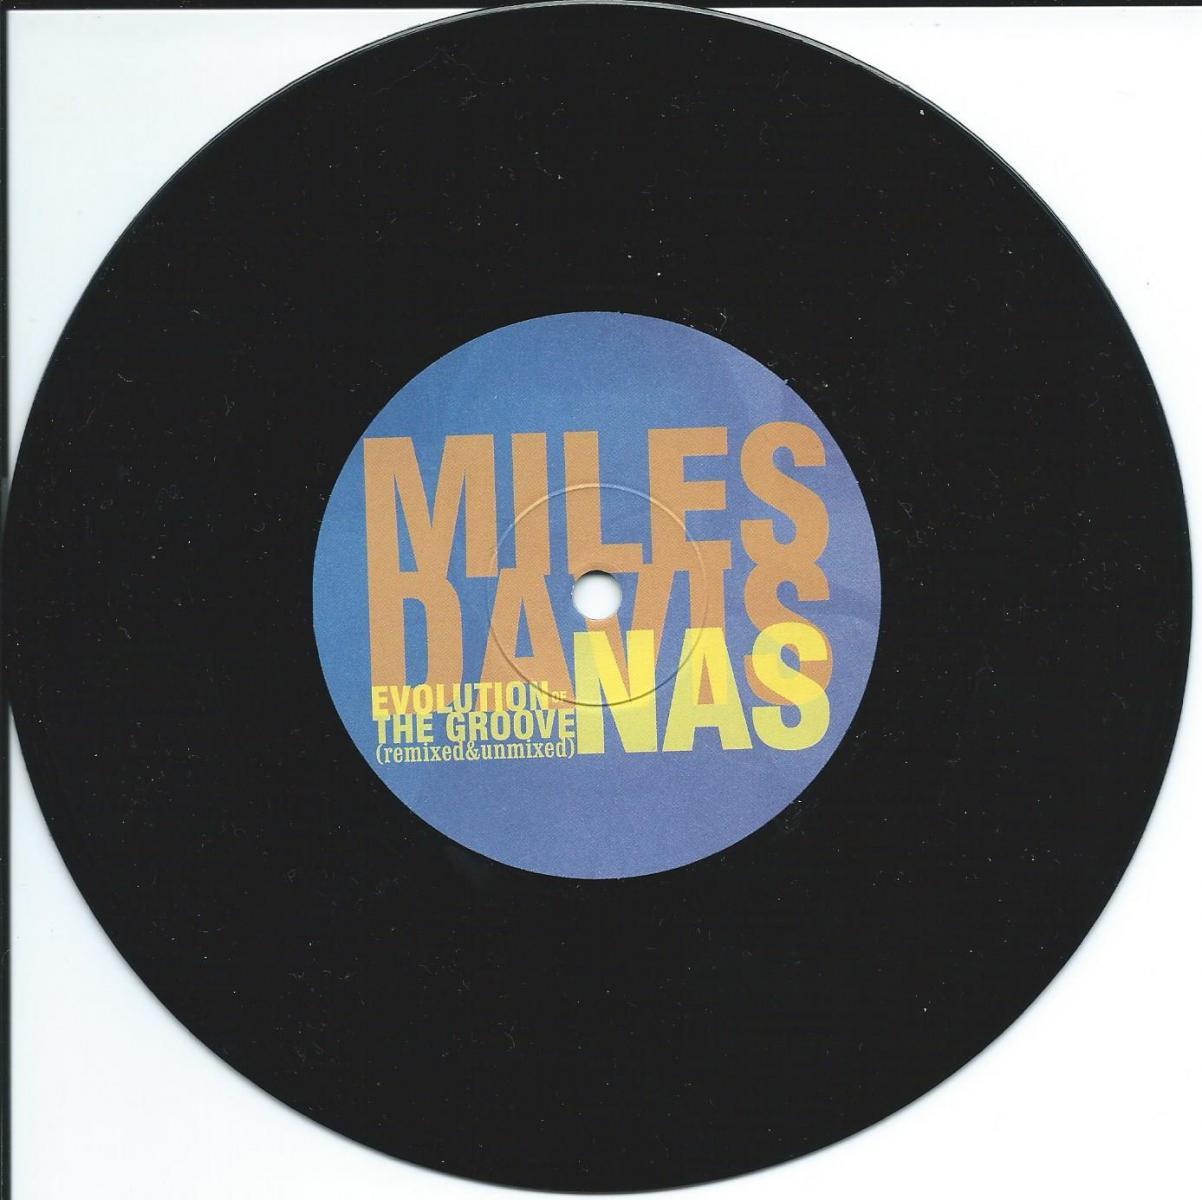 MILES DAVIS FEAT. NAS / FREEDOM JAZZ DANCE (EVOLUTION OF THE GROOVE) (7